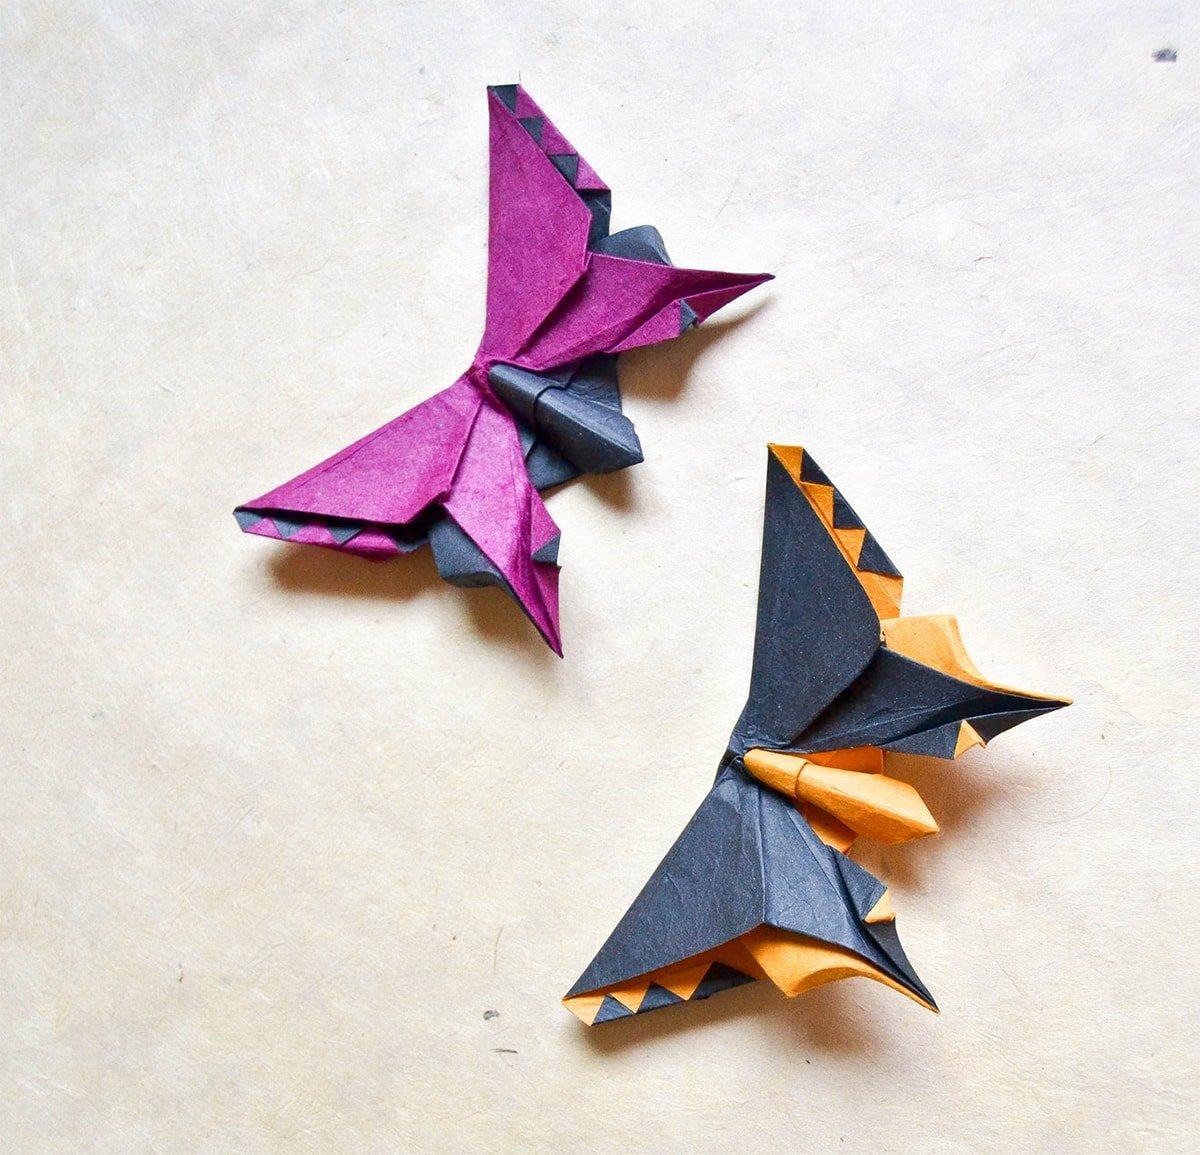 2 Origami Butterflies